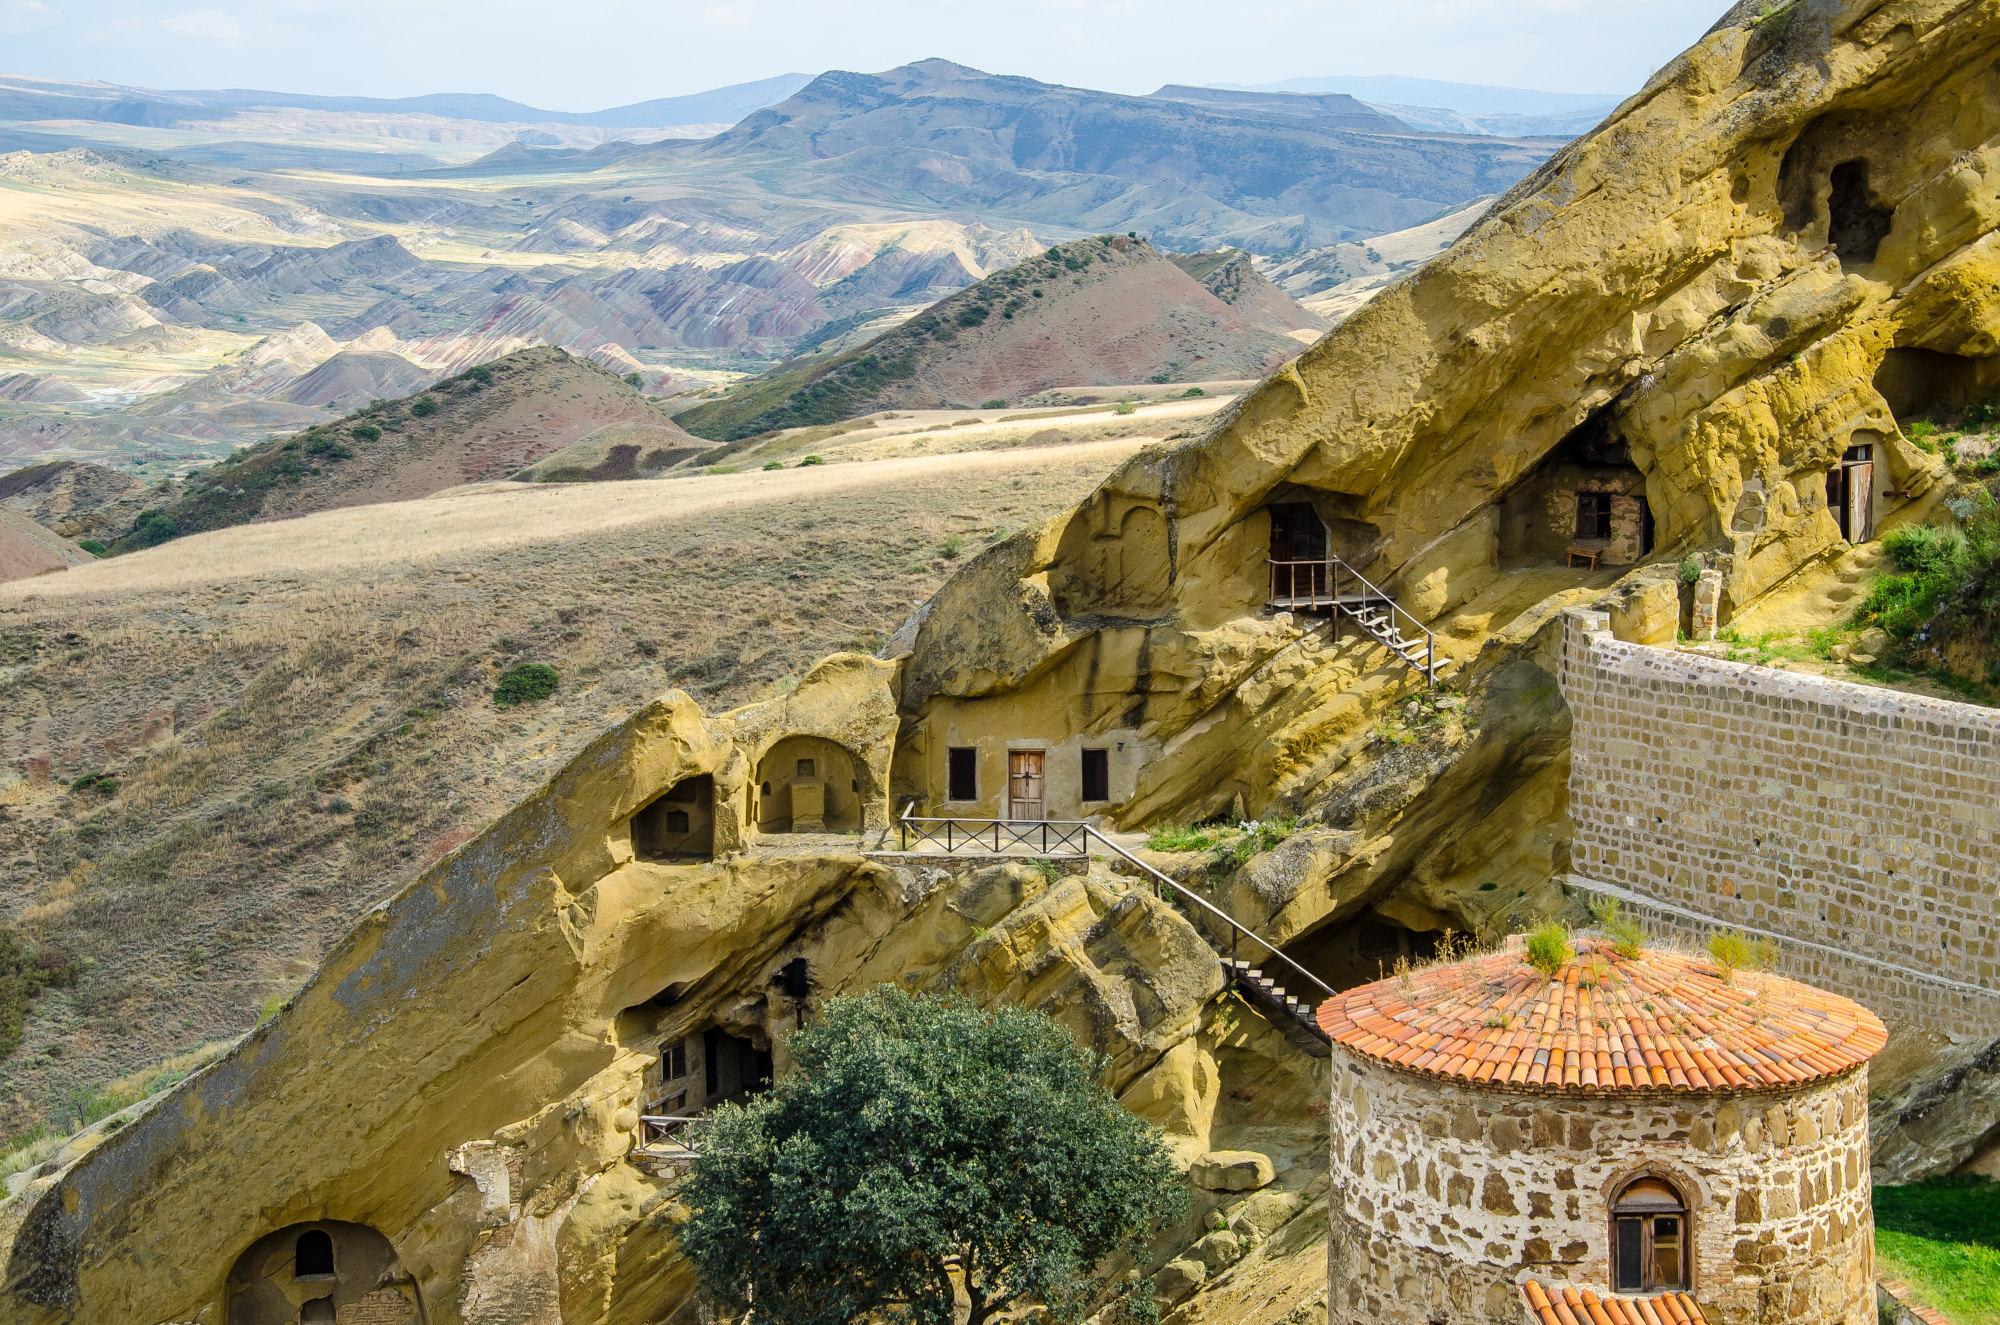 Old settlements